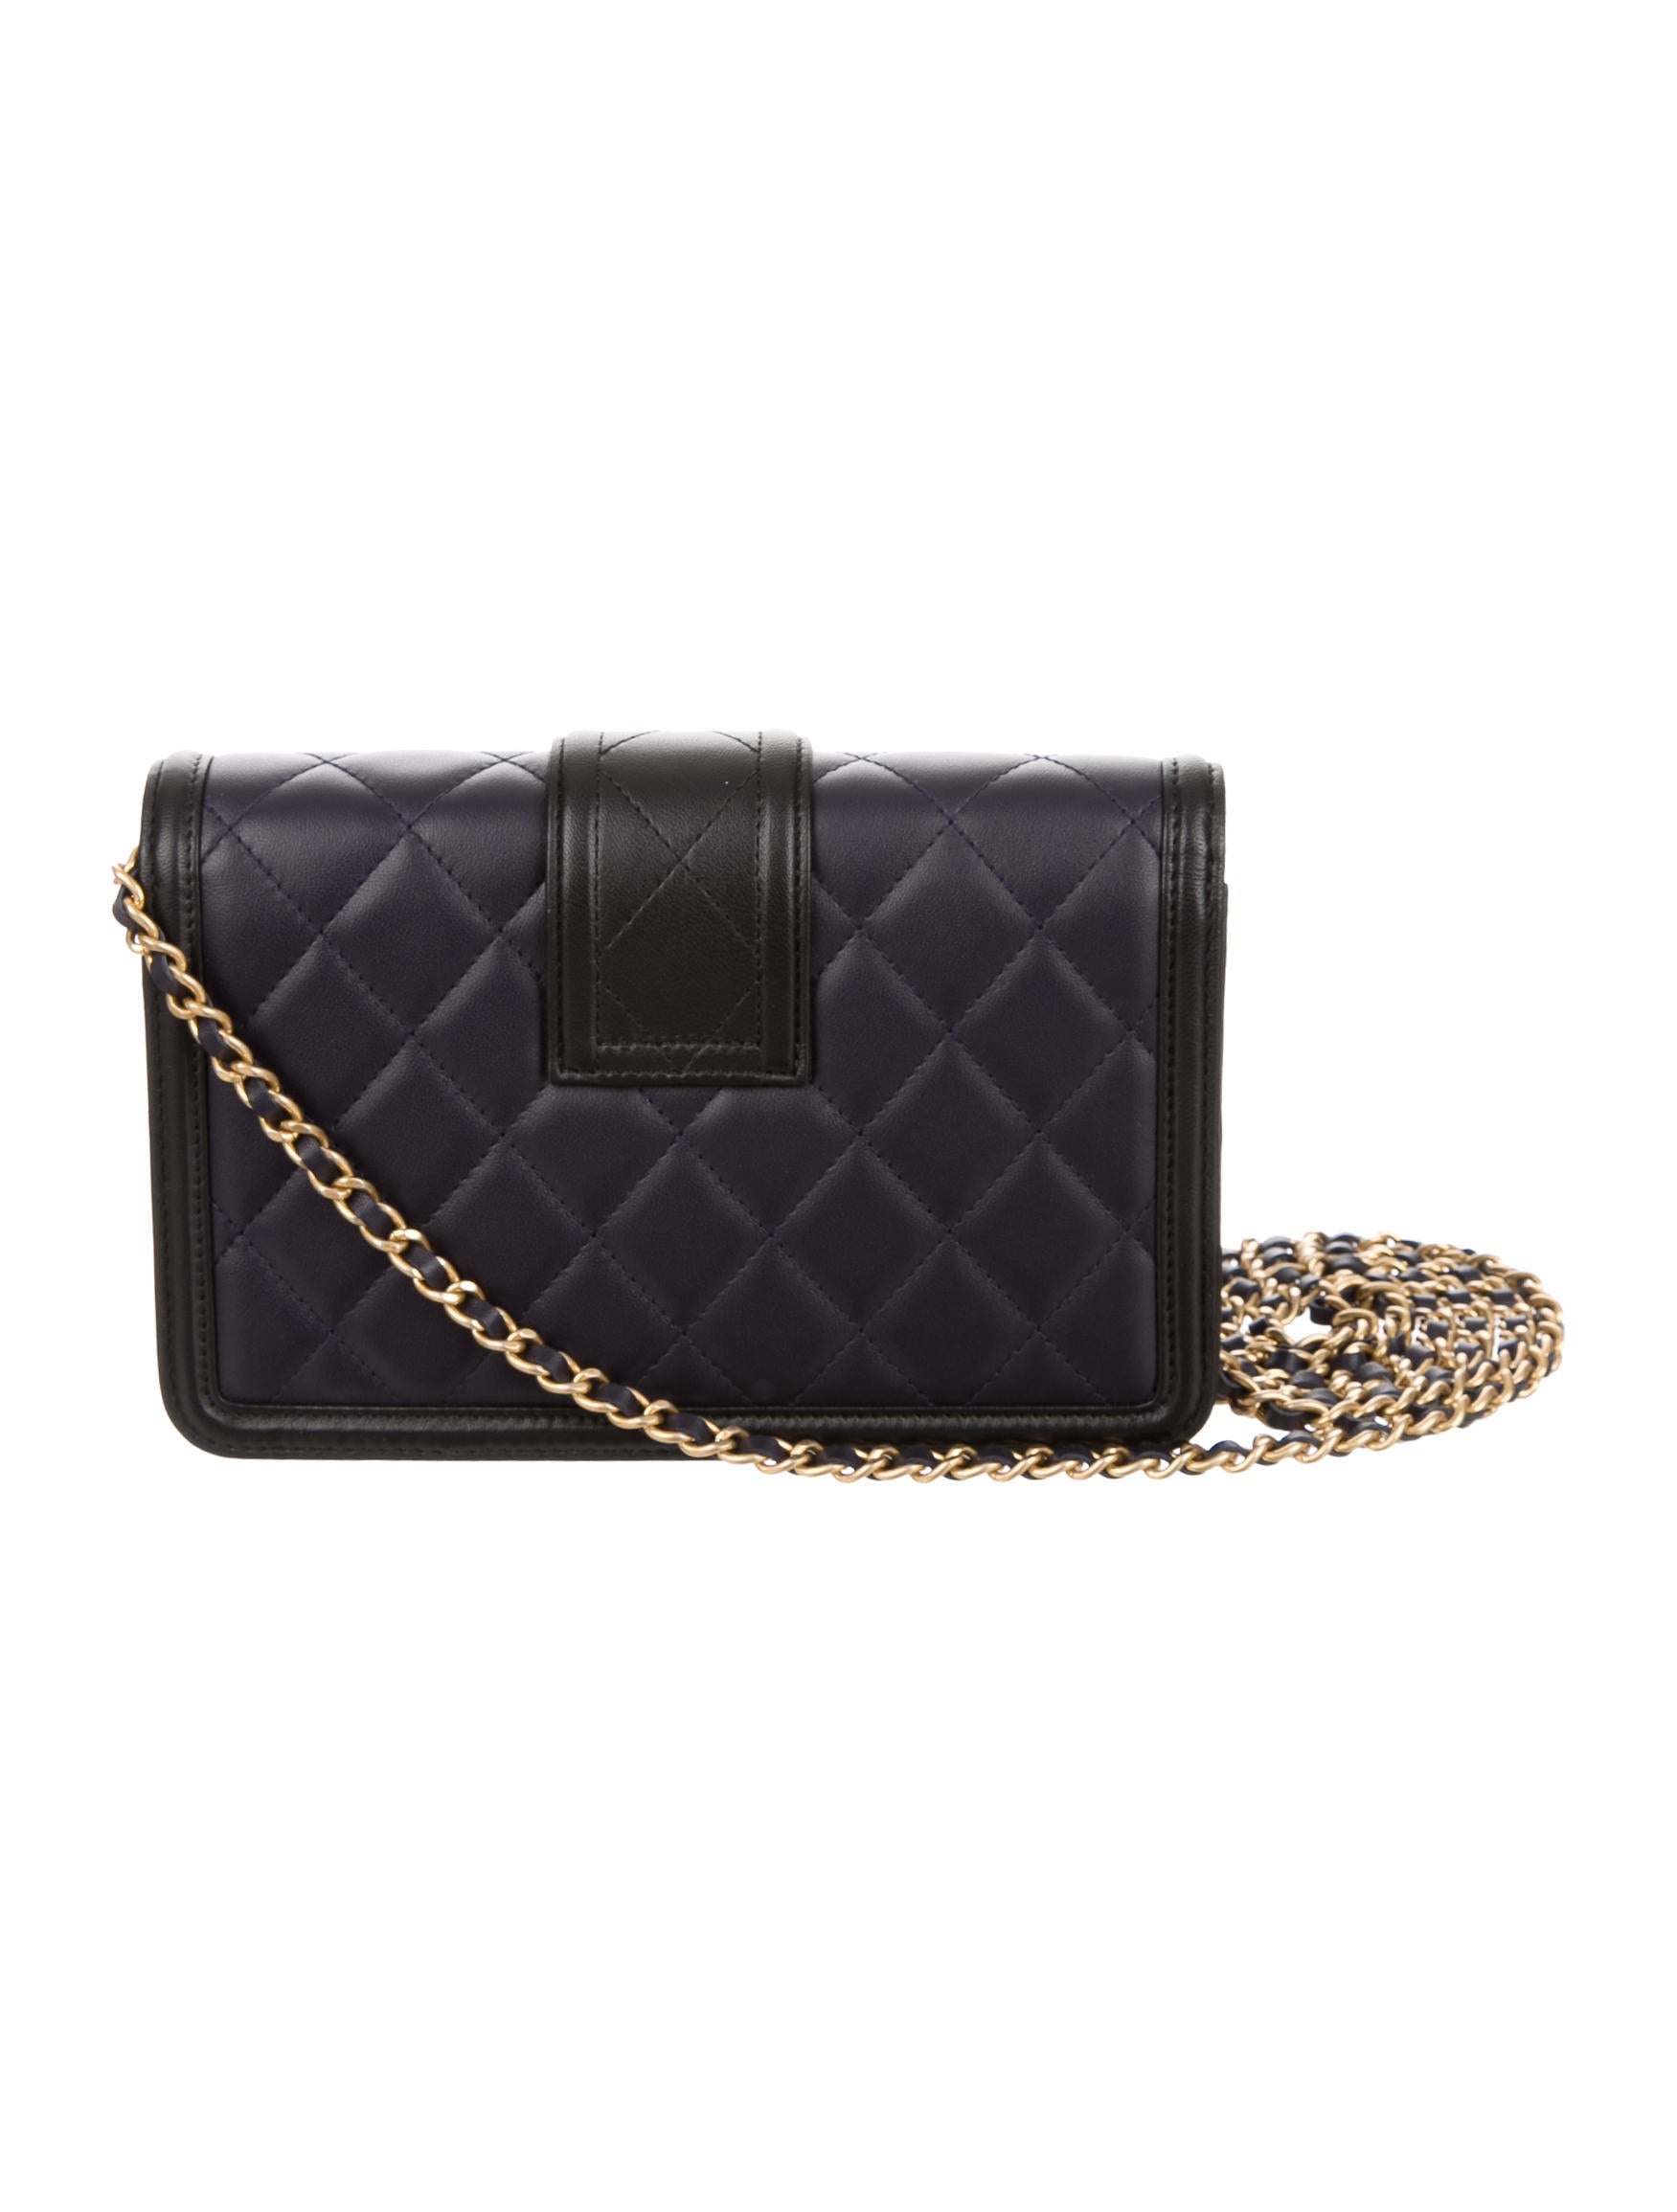 5848cf8225f7 Chanel 2016 Elegant CC Wallet On Chain w/ Tags - Handbags - CHA168380 | The